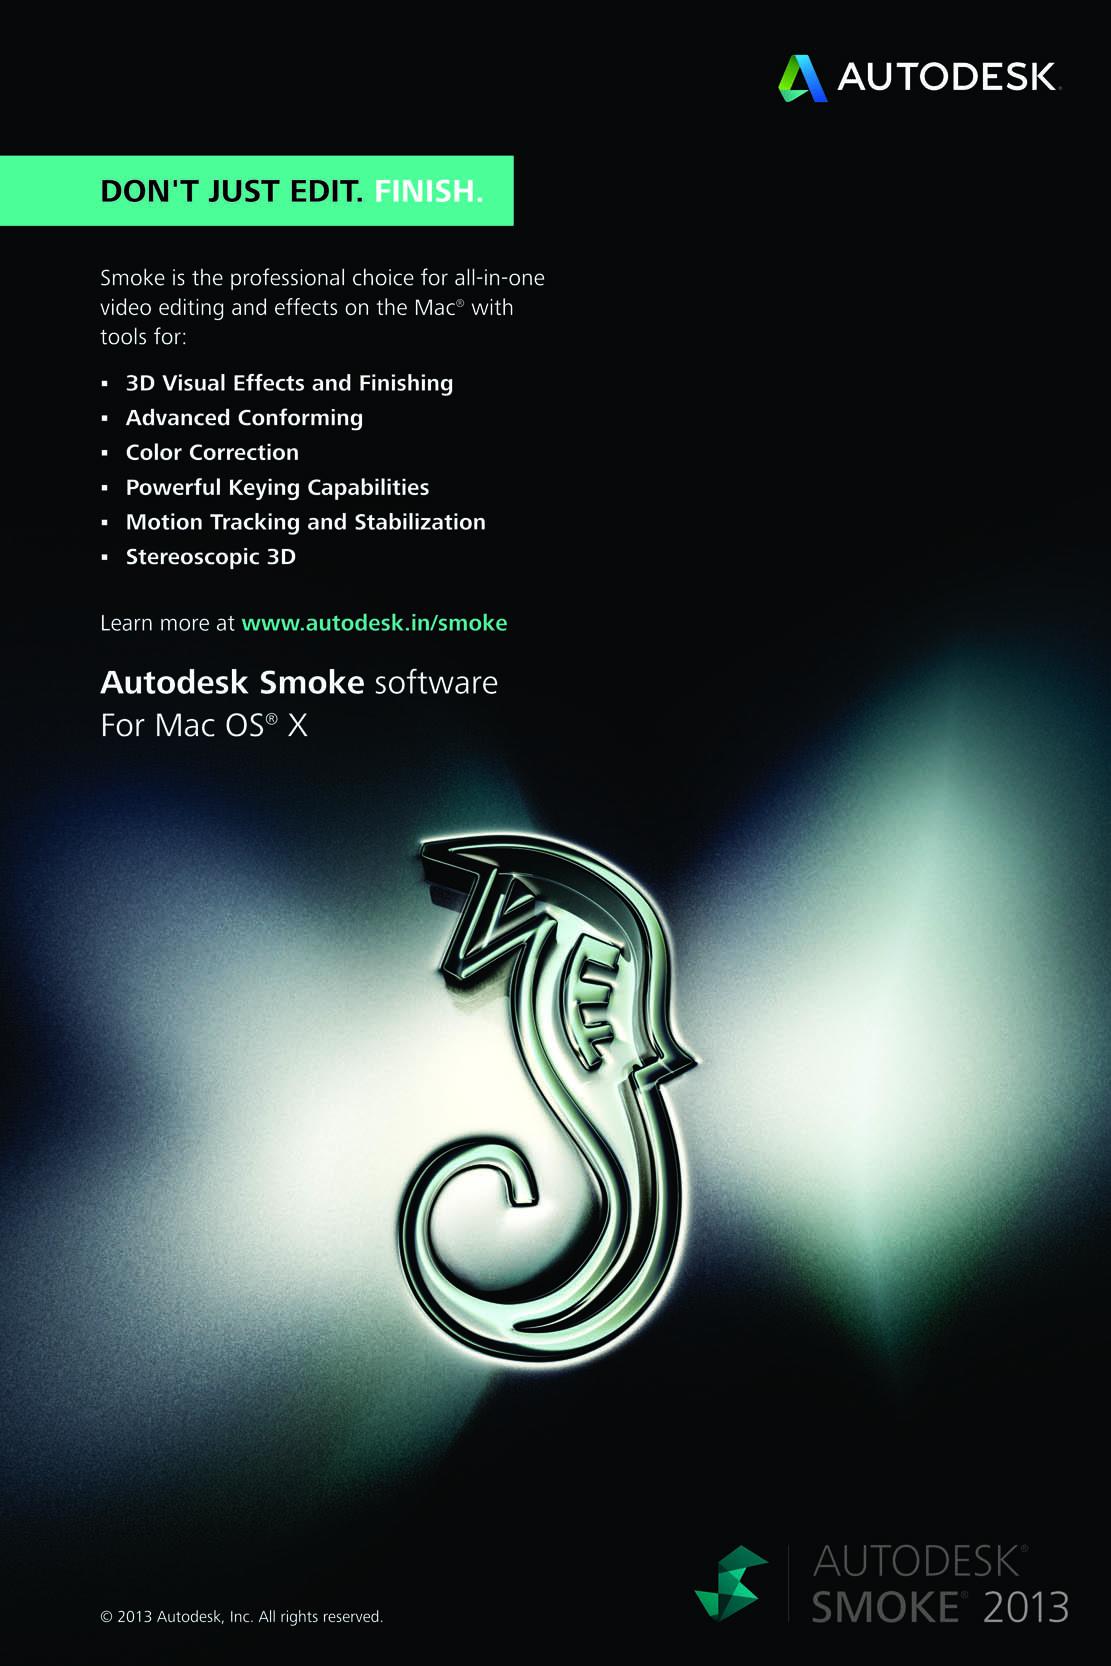 Autodesk Poster